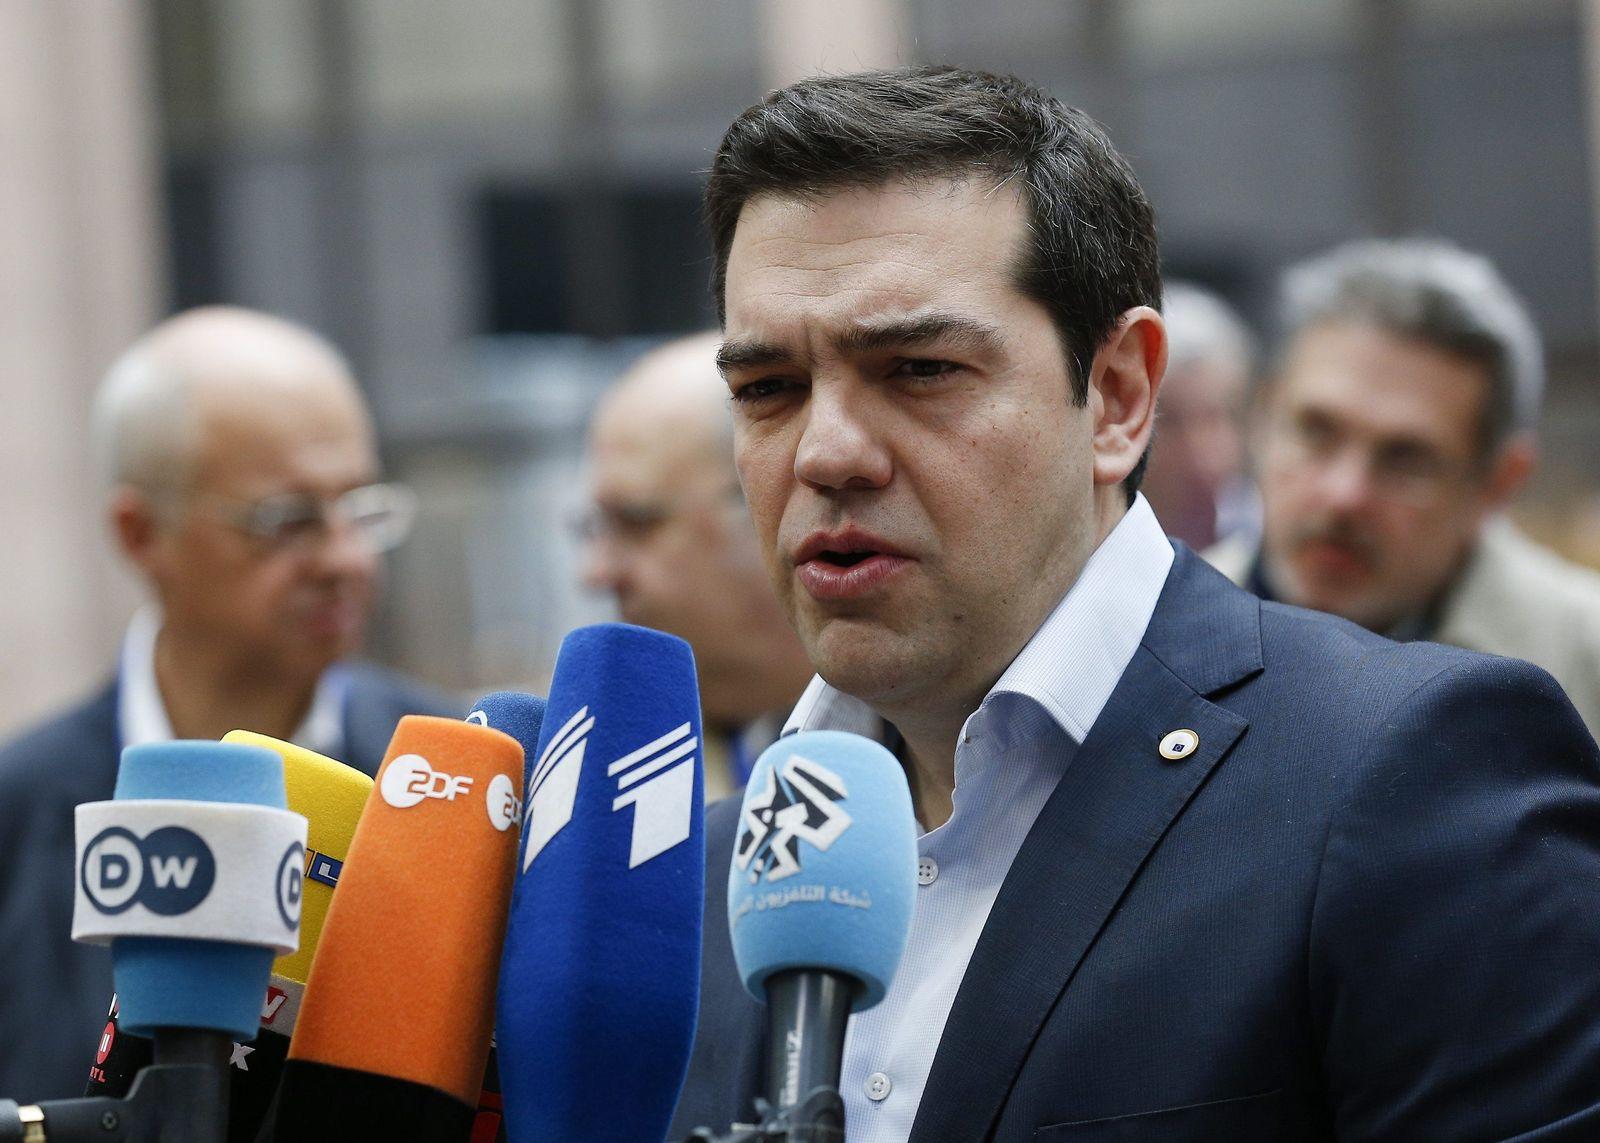 Tsipras / Brüssel